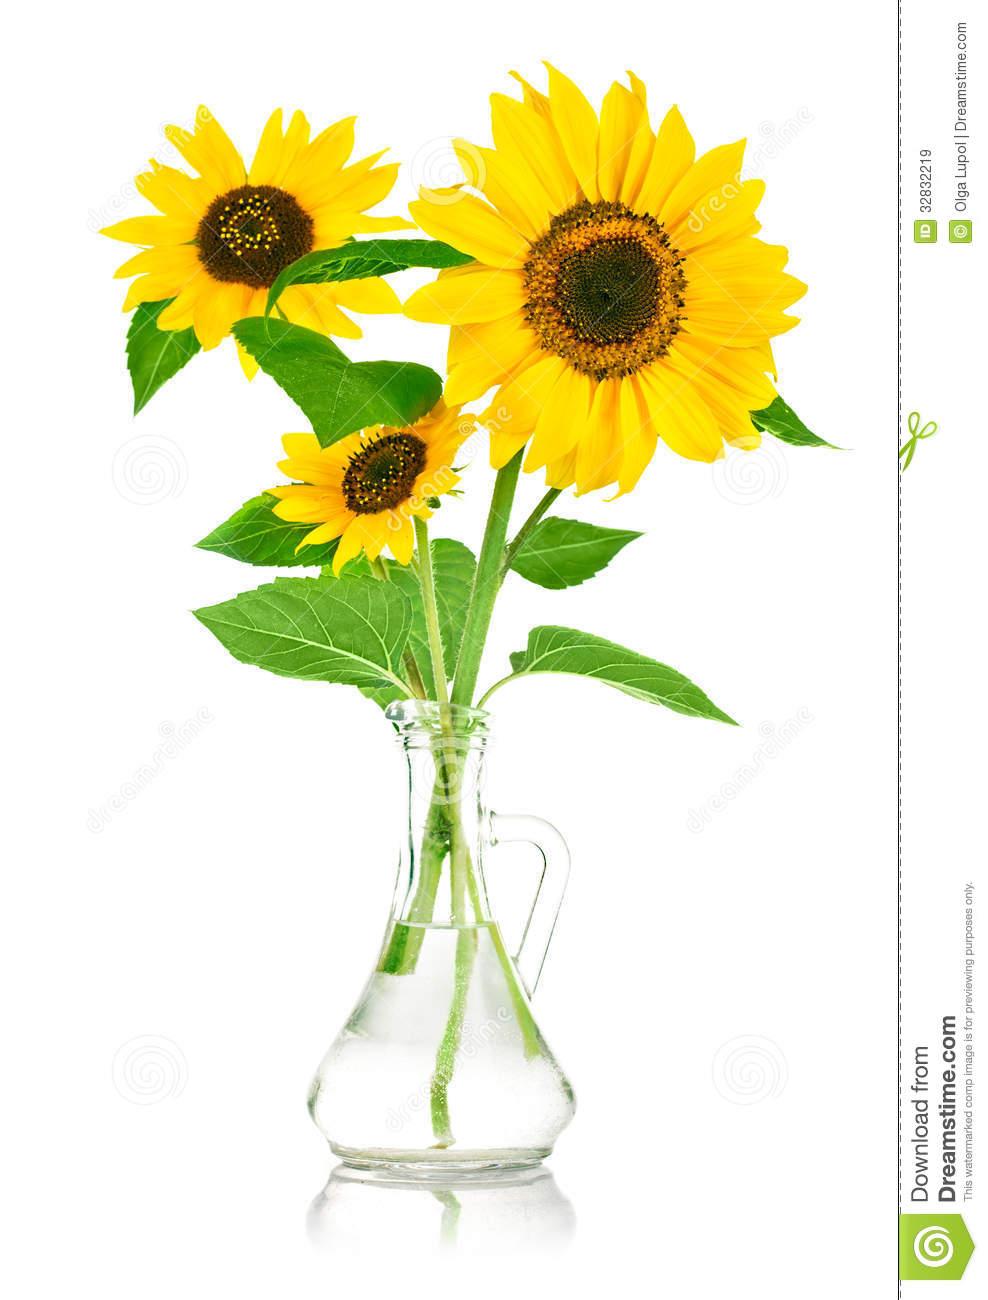 988x1300 Clip Art Flowers In A Vase Clip Art